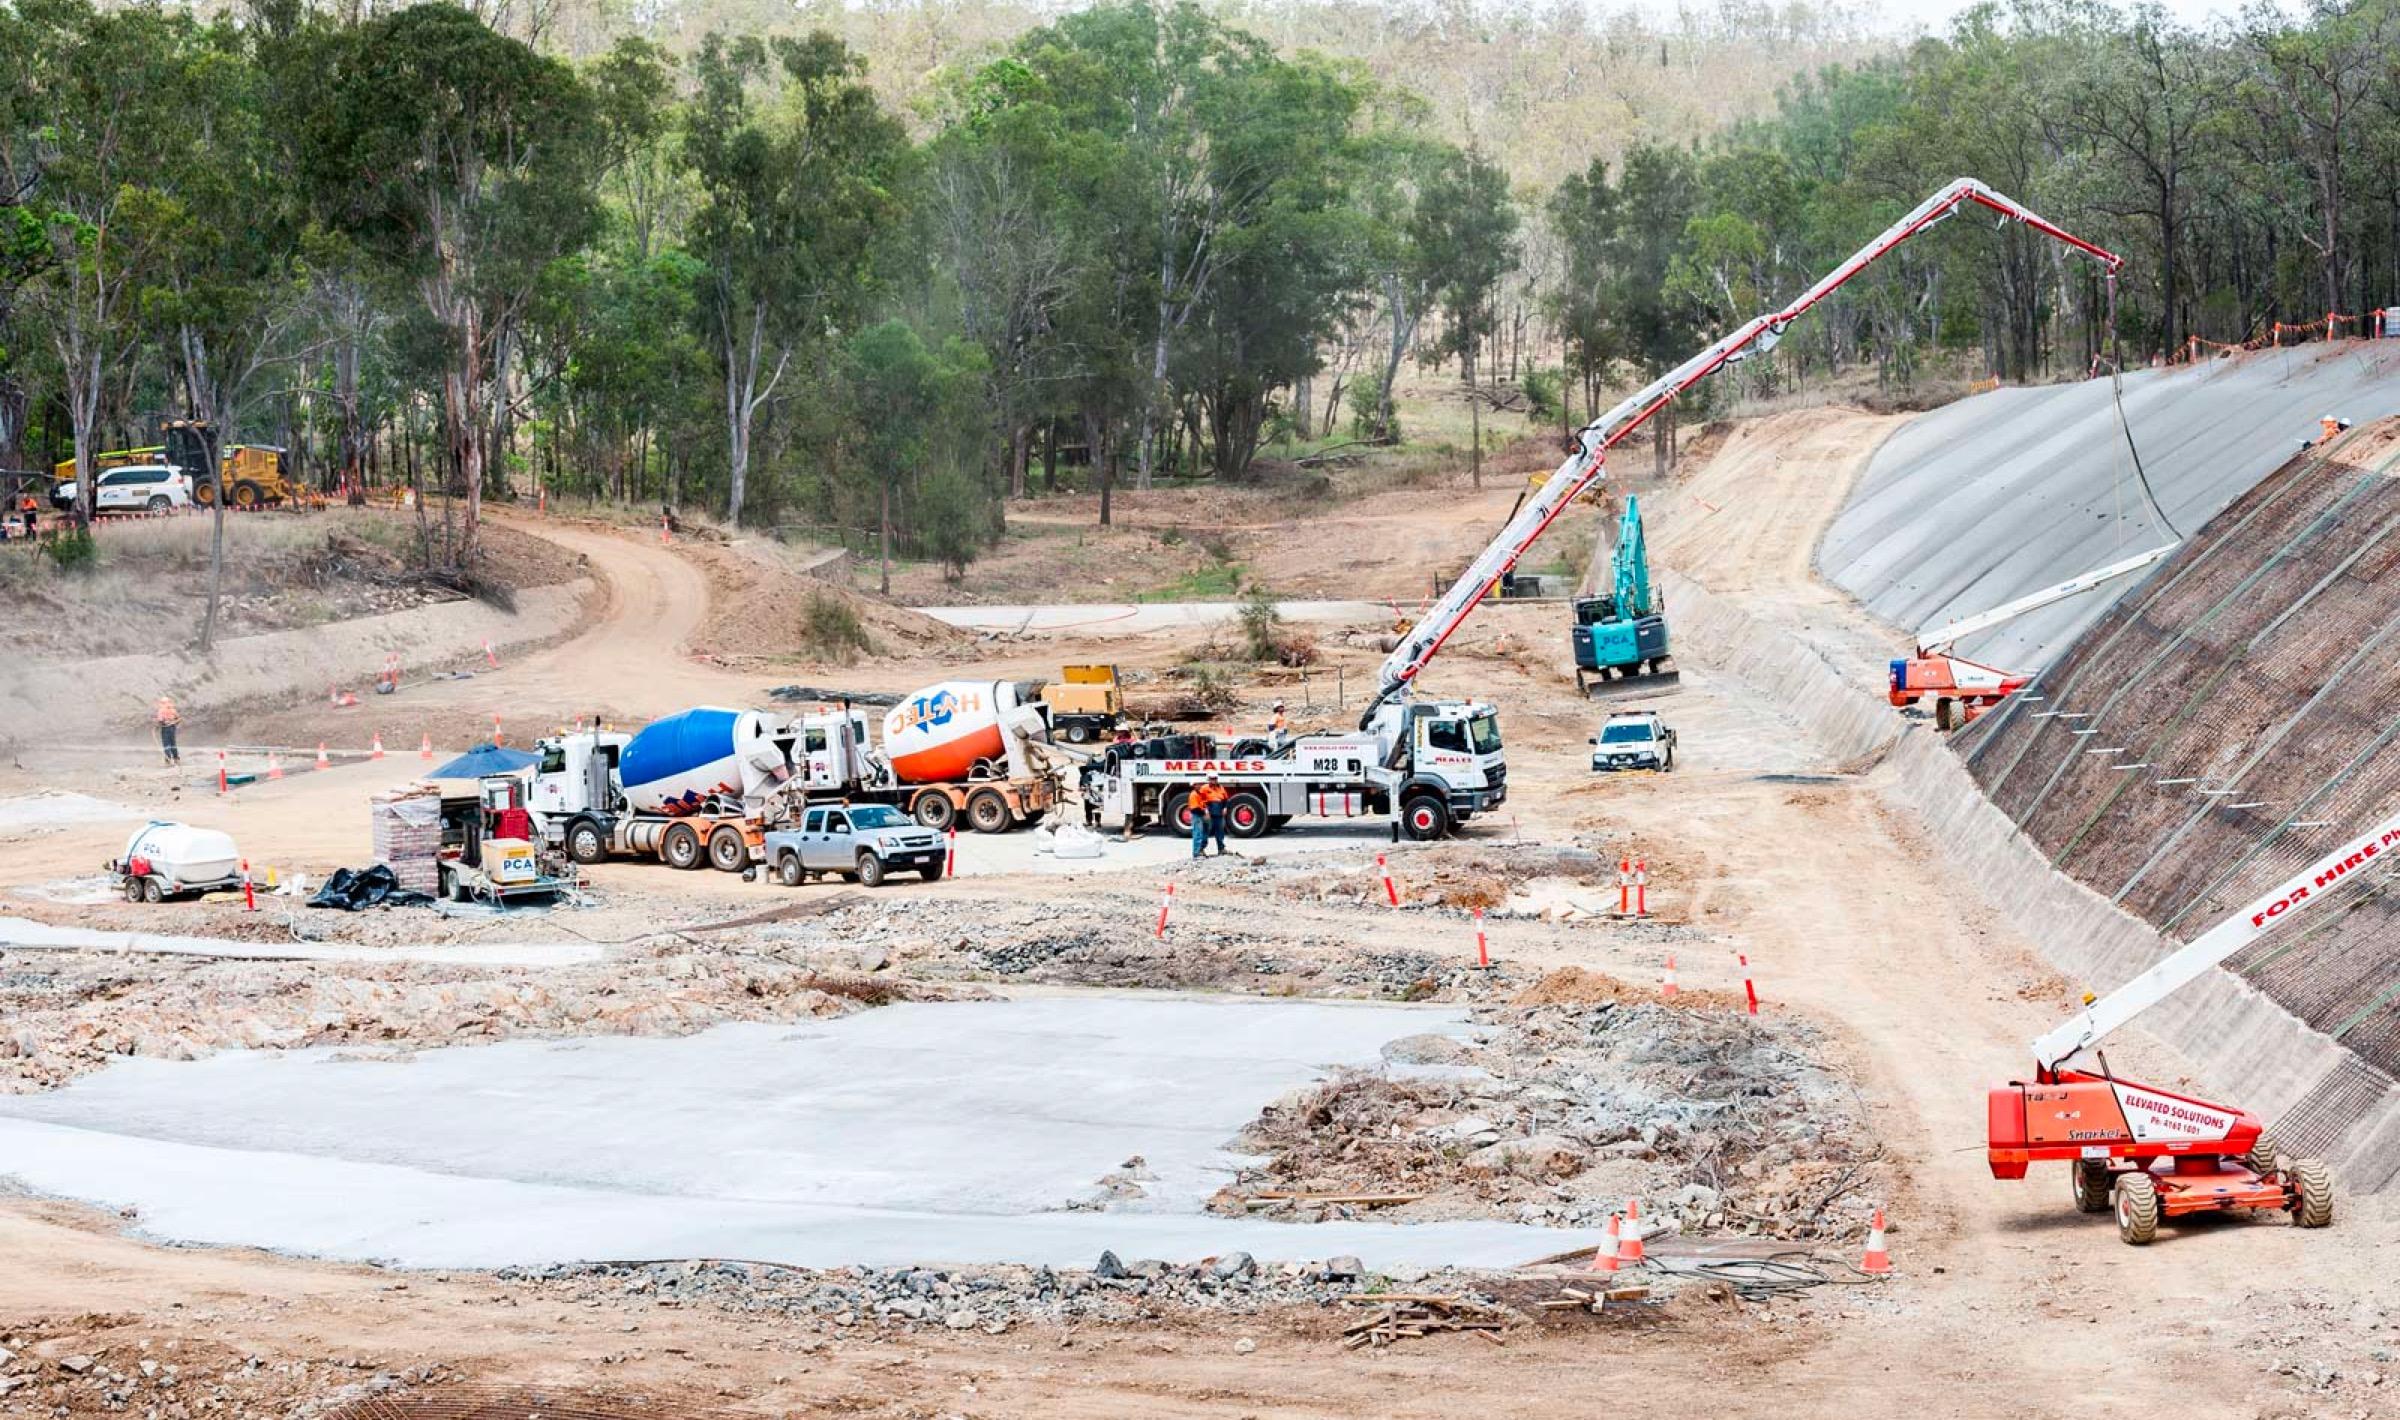 Gordonbrook Dam Spillway Repairs